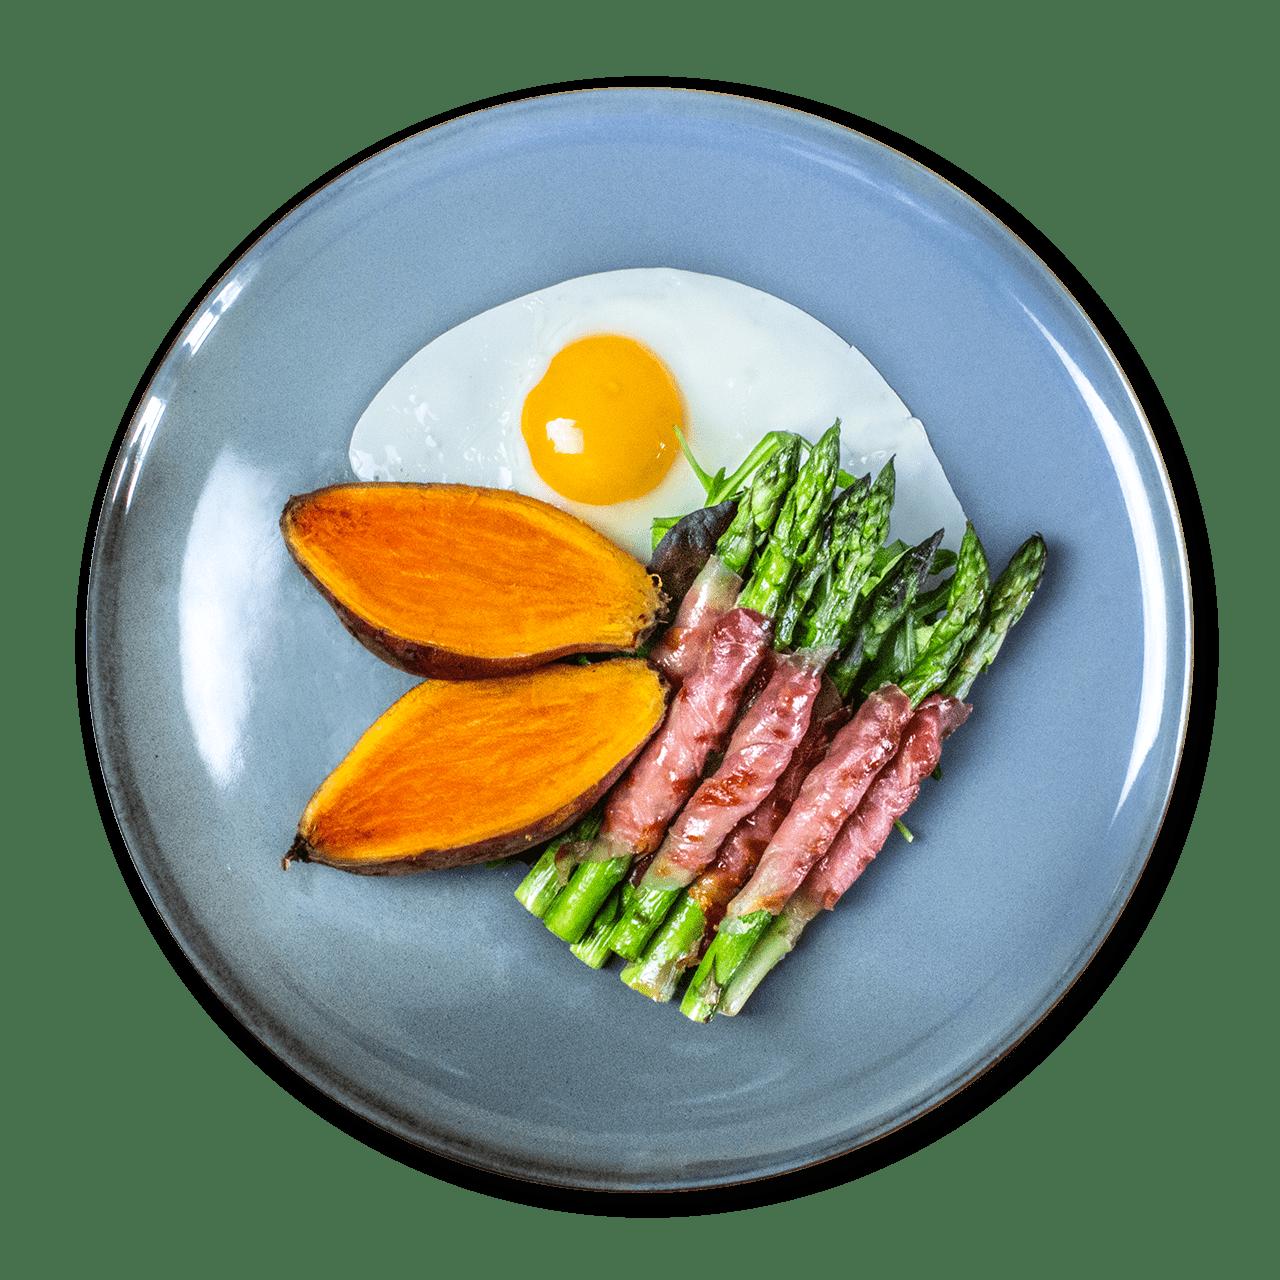 tostibanaan-asperges-serrano-ham-aardappel-ei